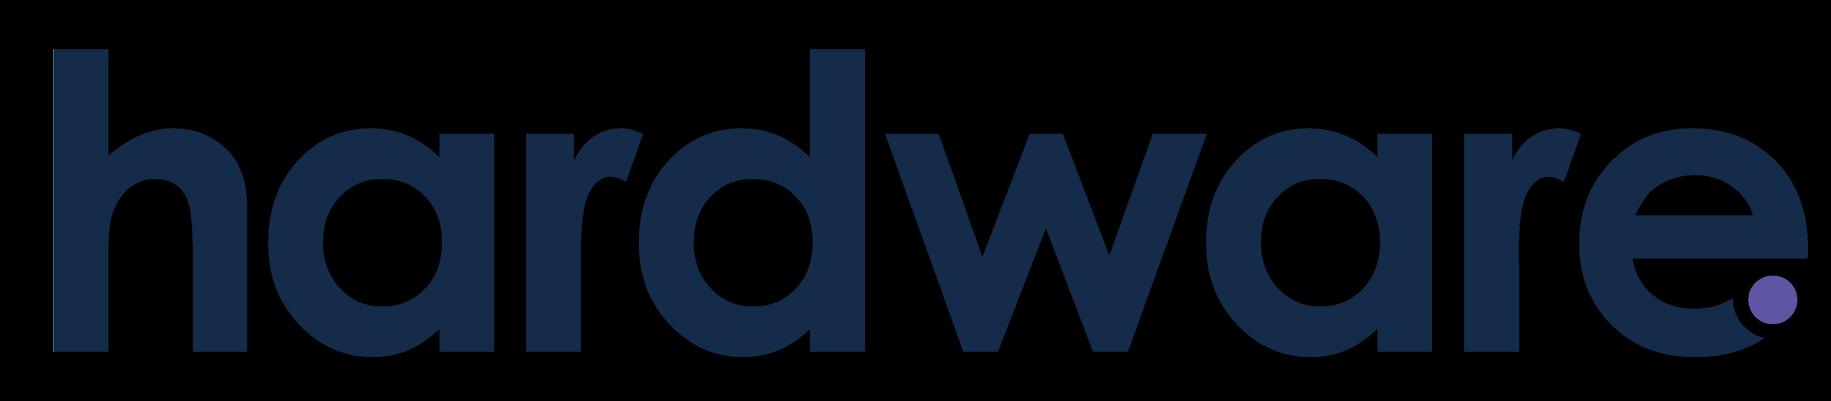 Hardware Distribution